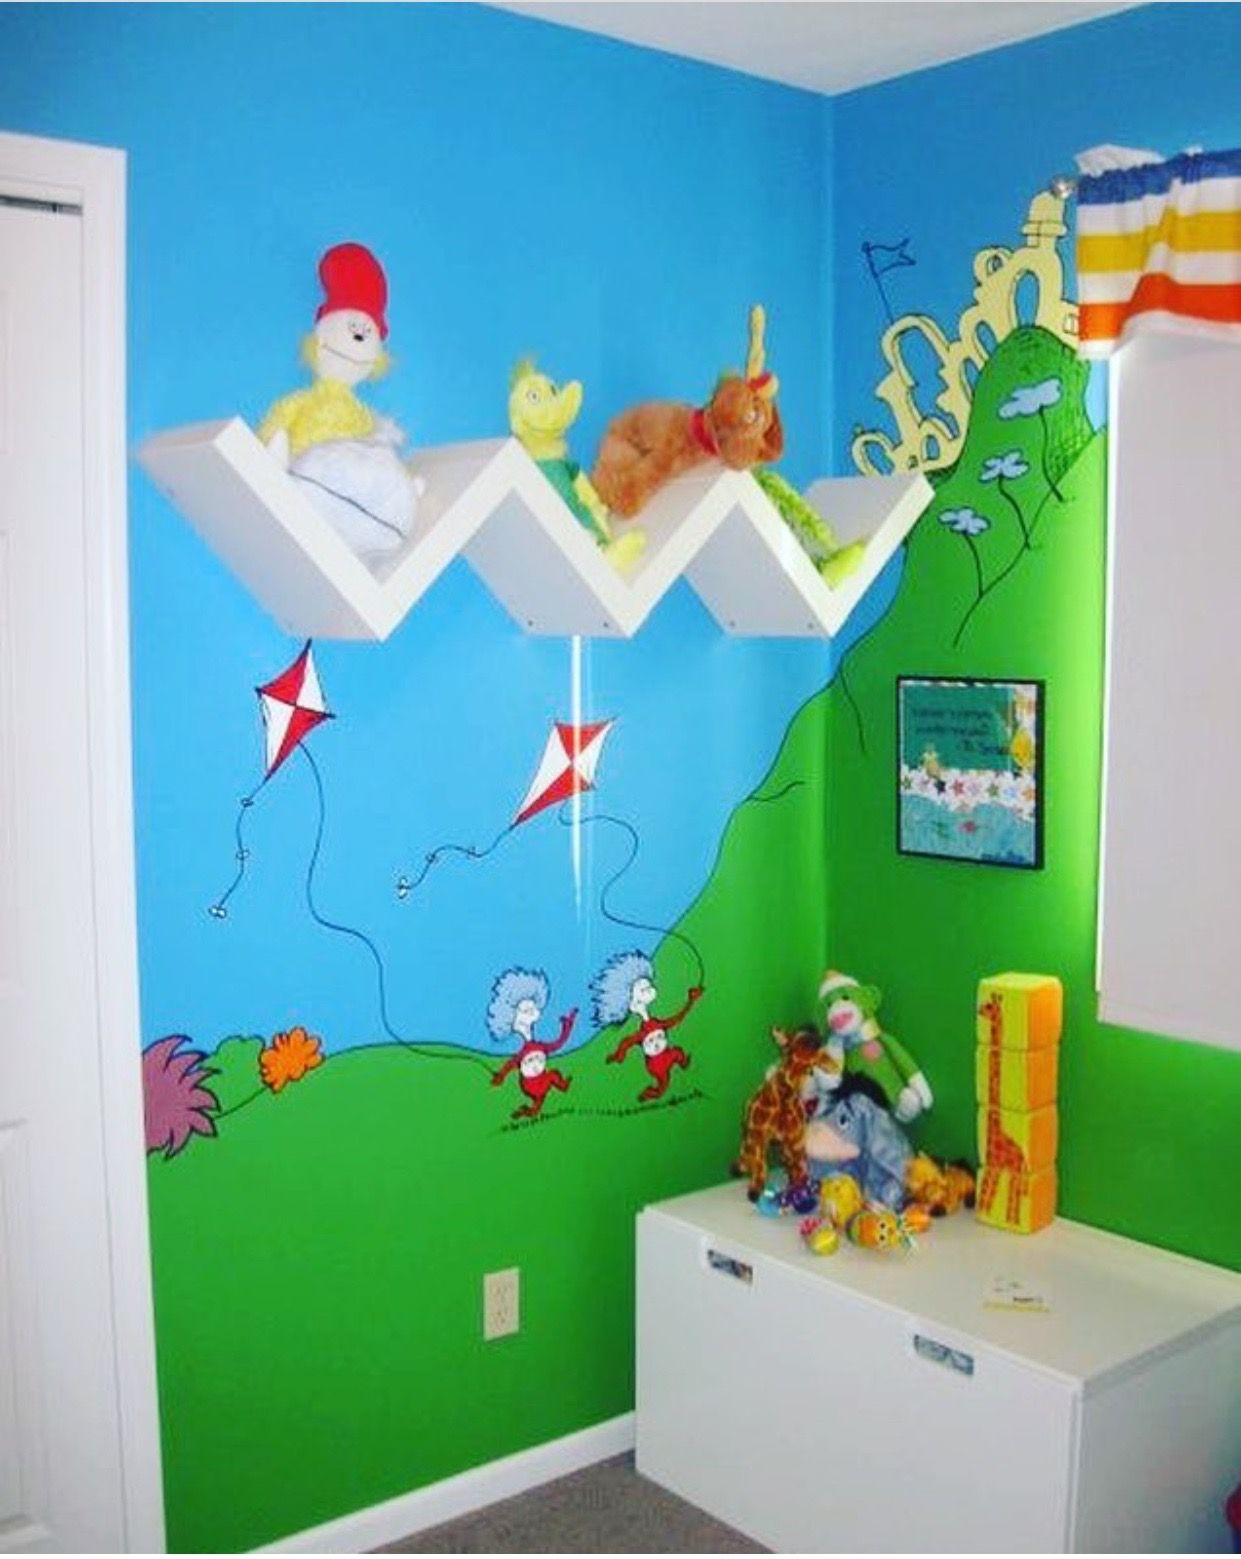 Dr Seuss Room Decorating Ideas from i.pinimg.com